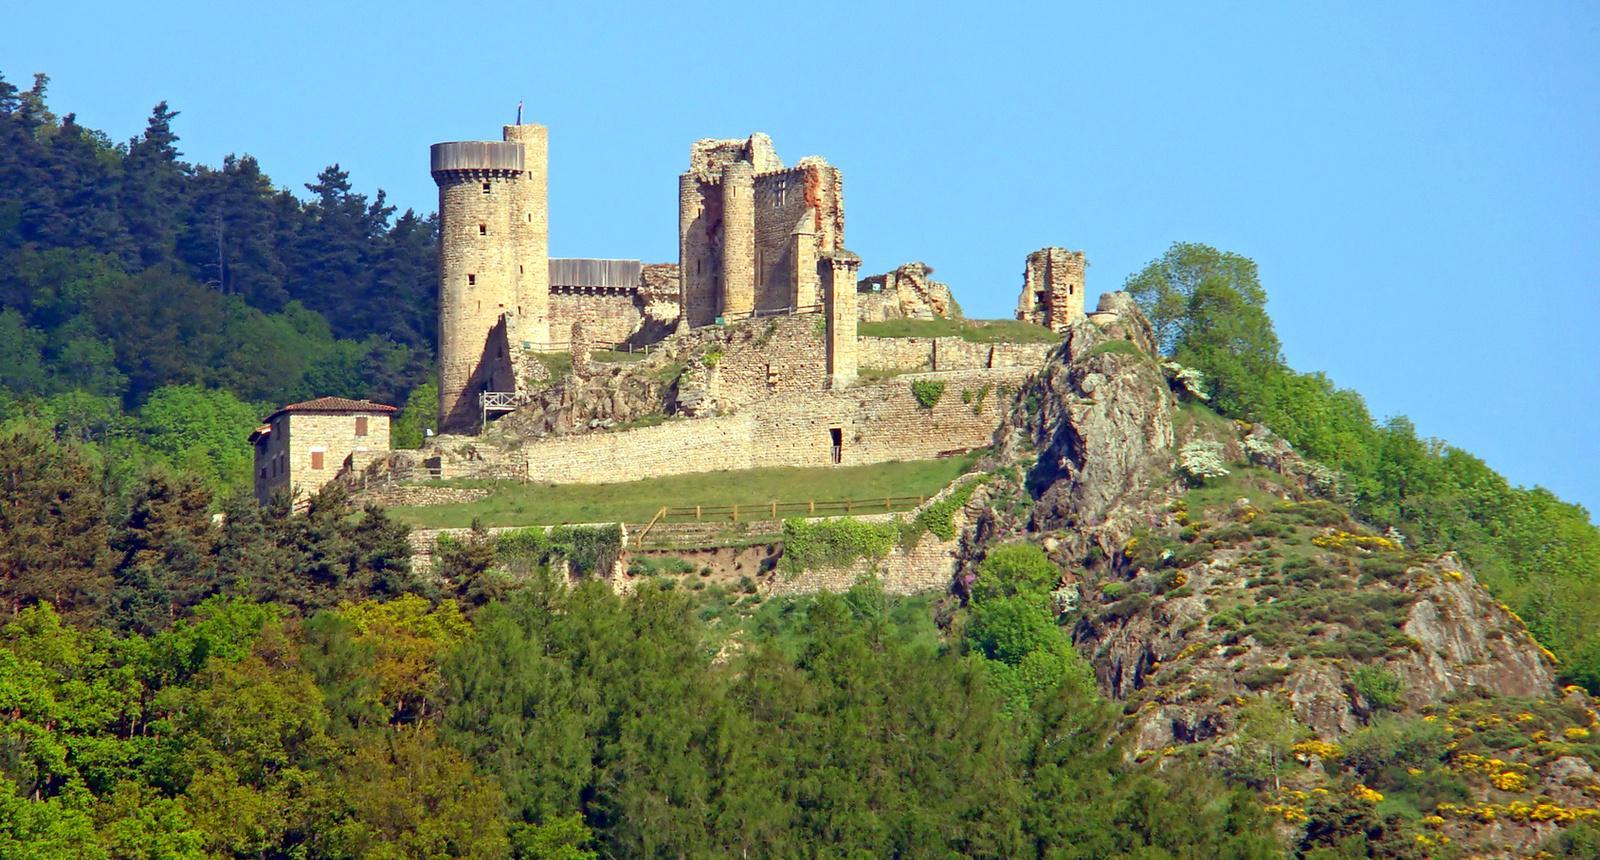 Château de Rochebaron, Bas-en-Basset